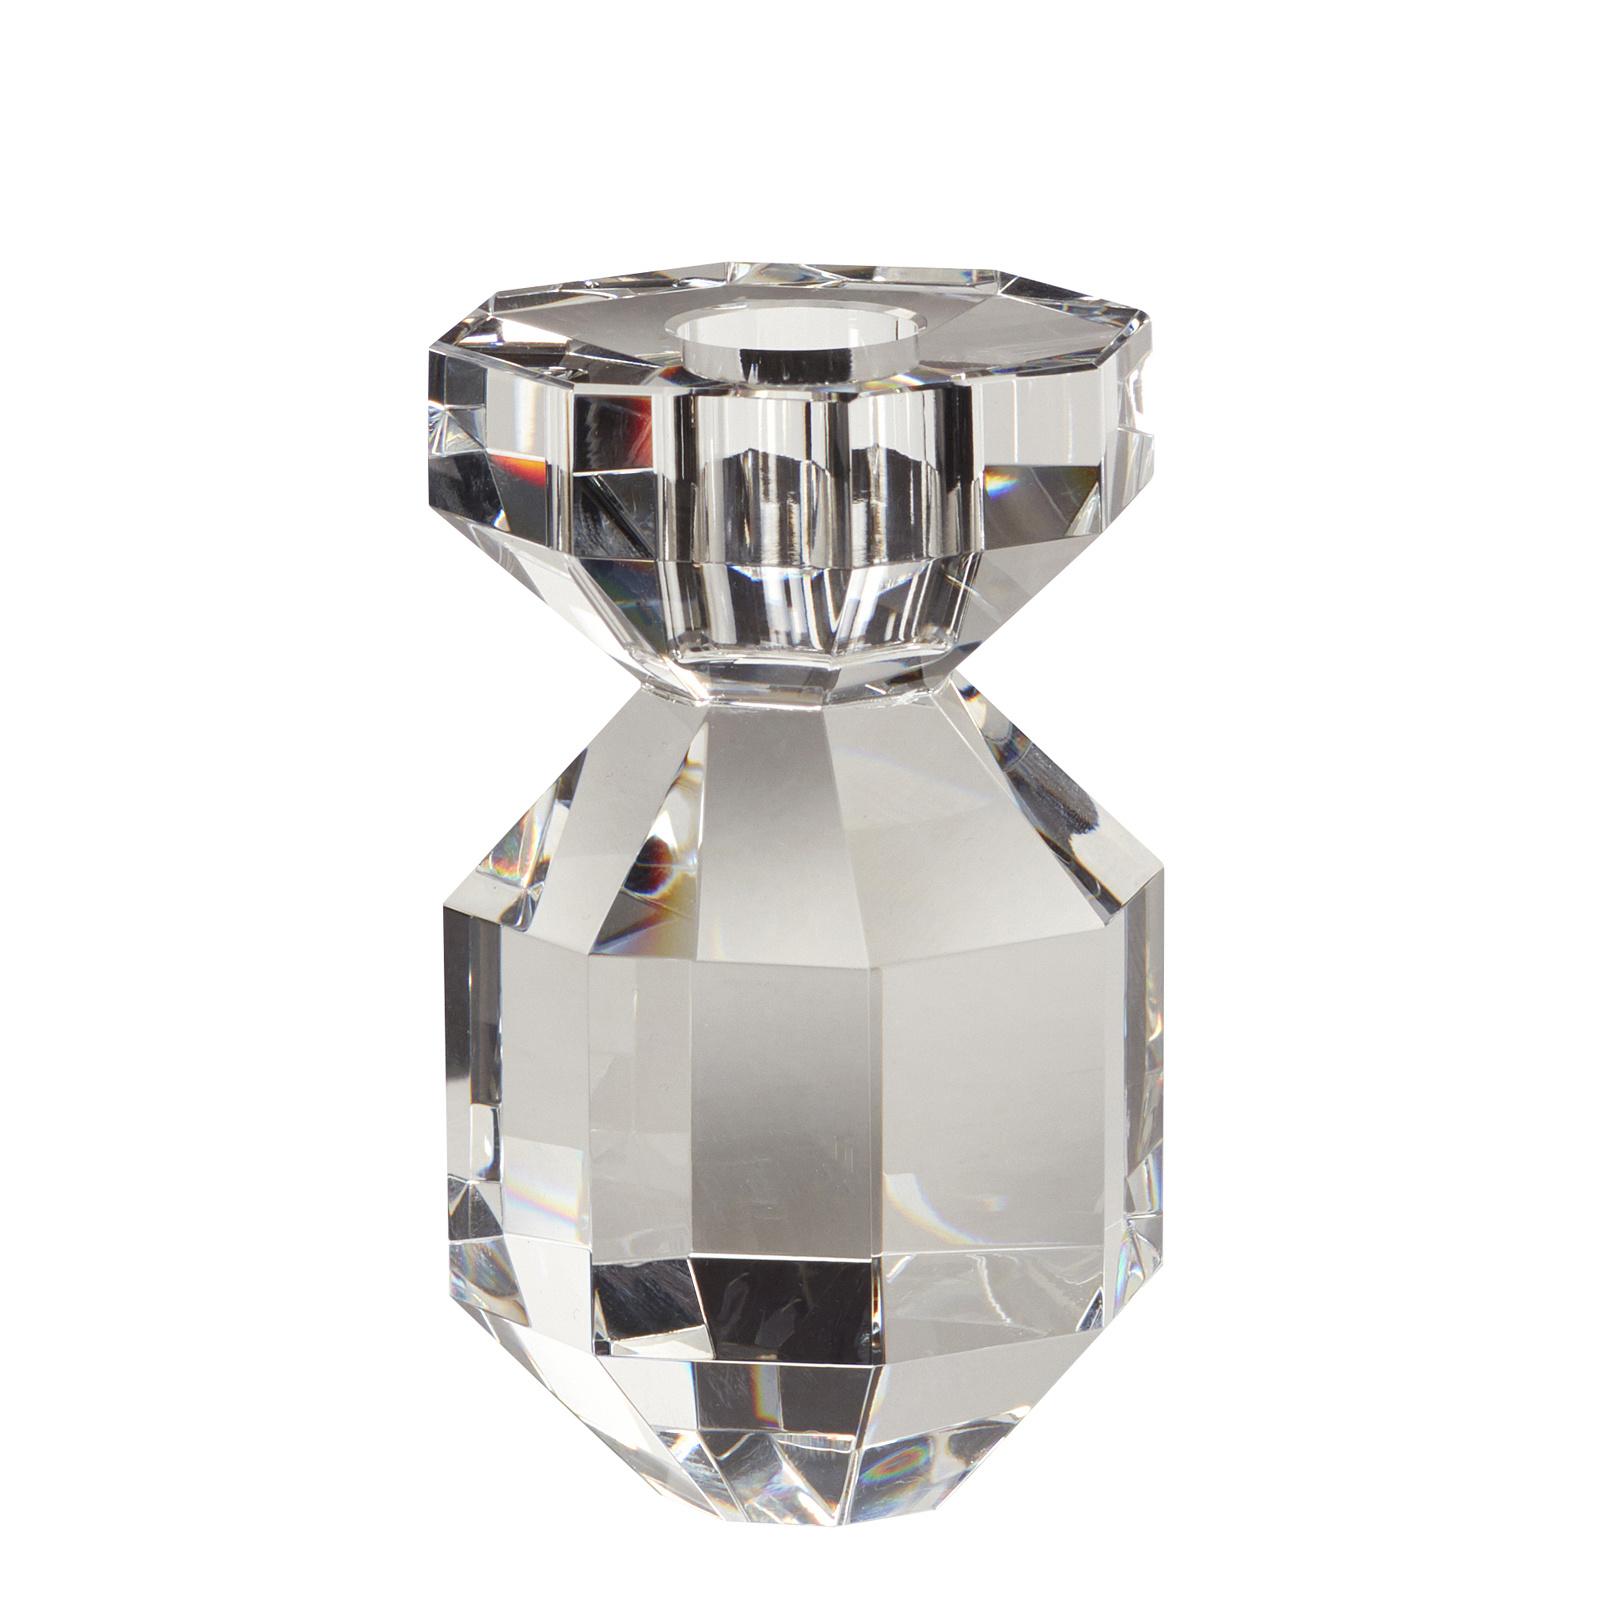 Hubsch Kandelaar, glas, helder-340908-5712772070451